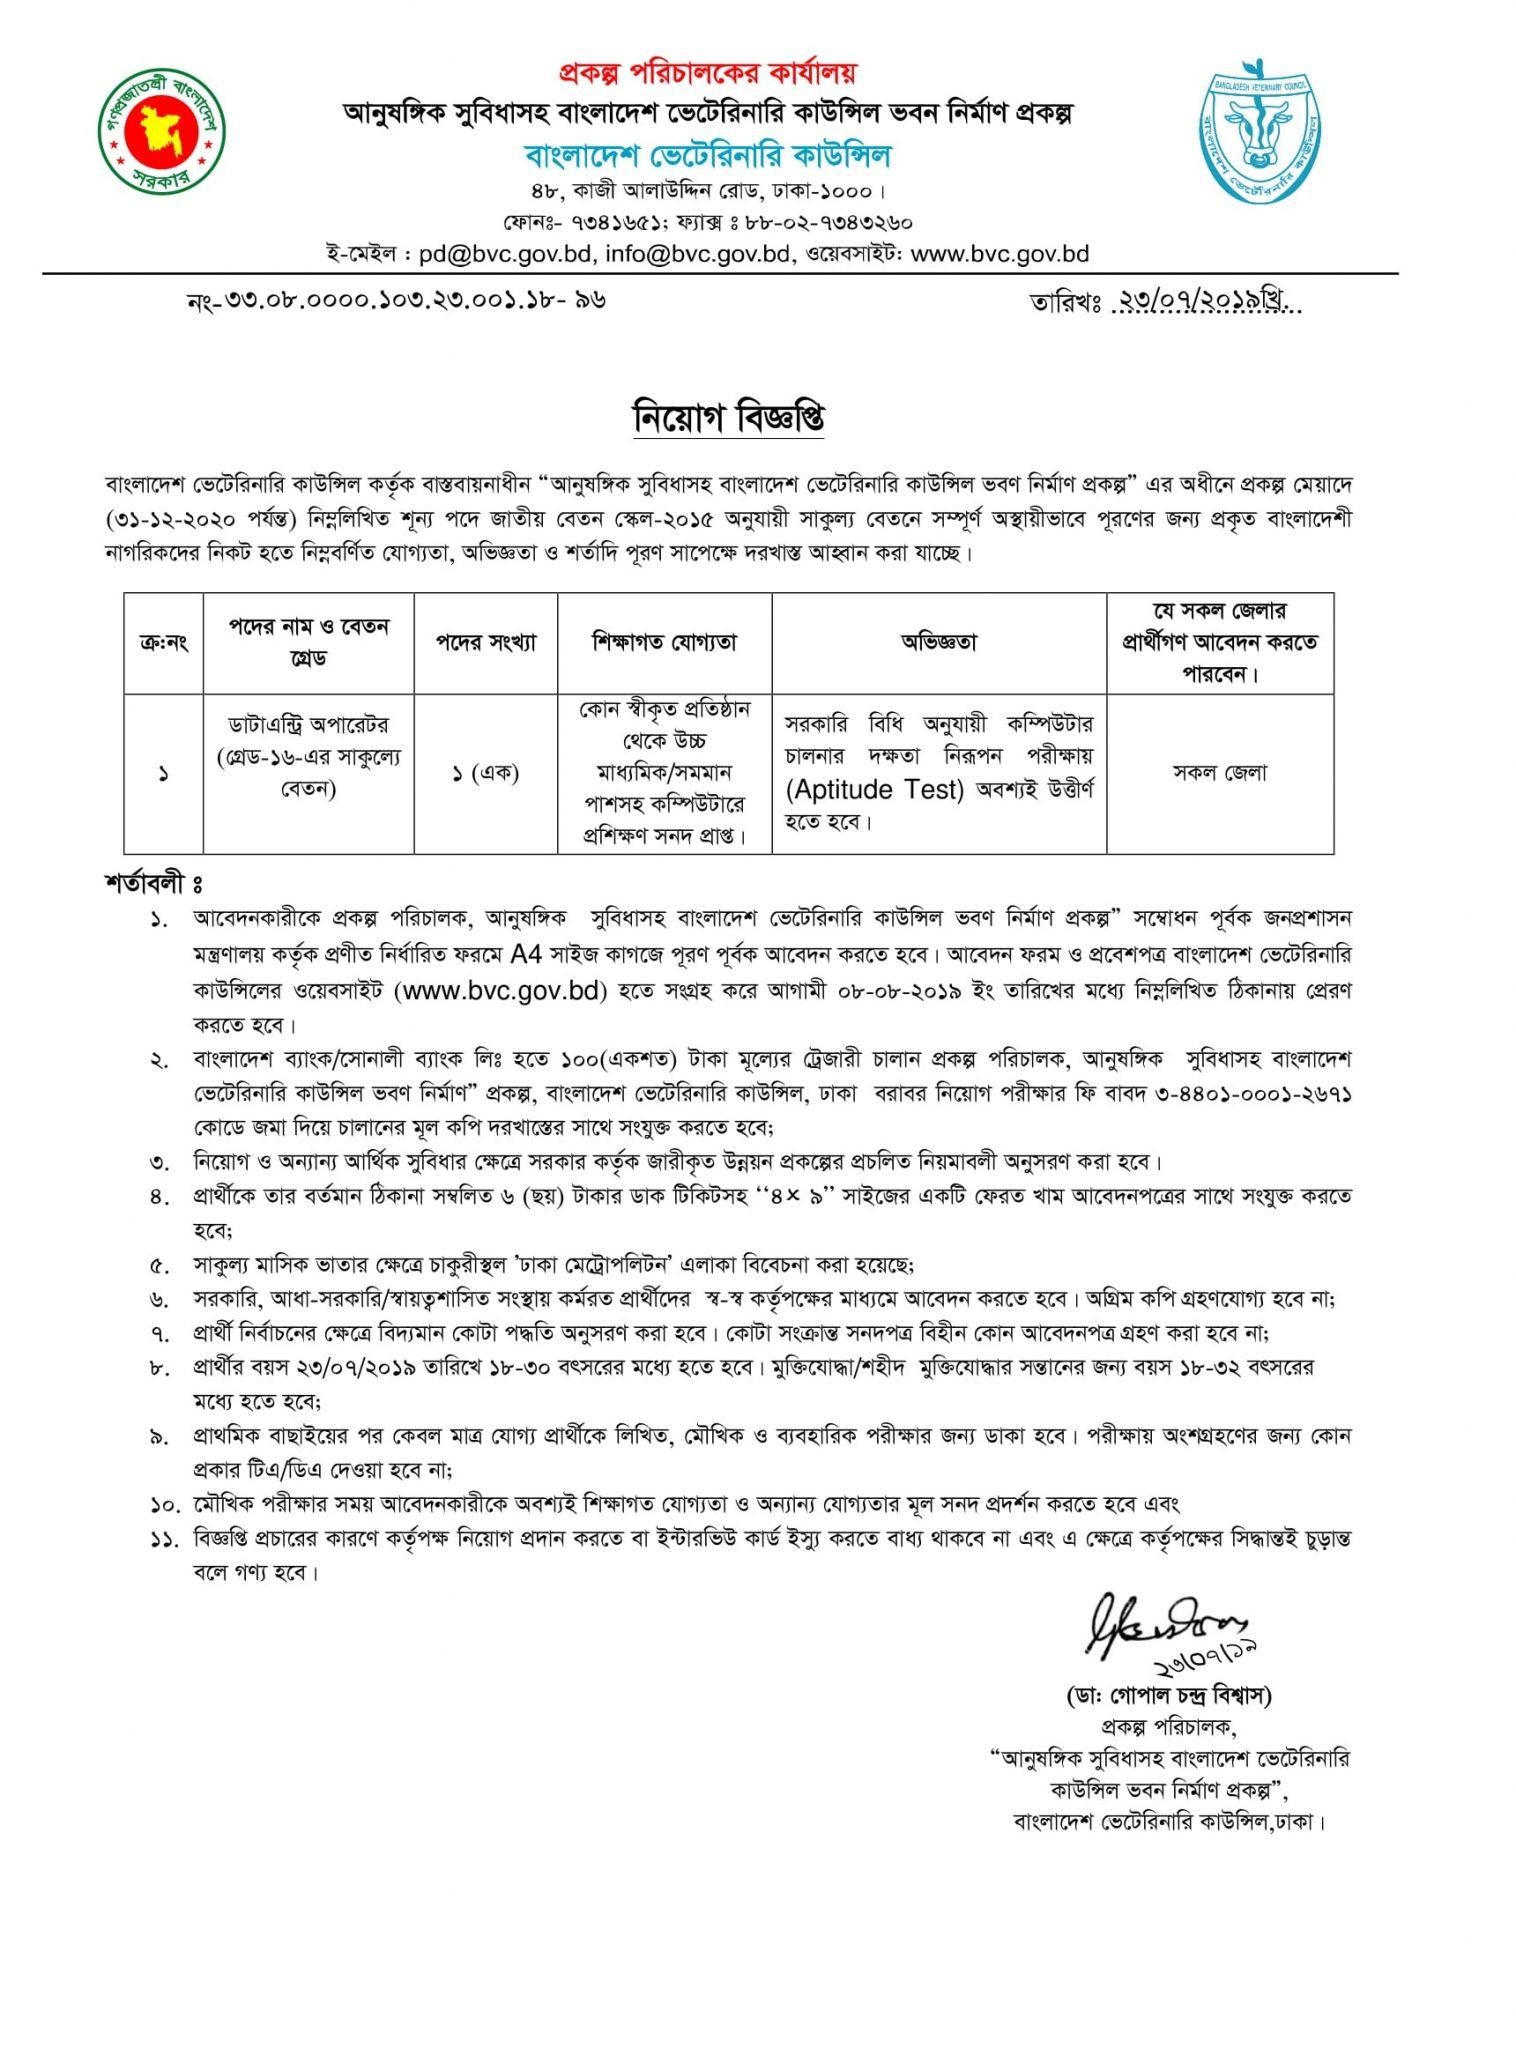 Bangladesh Veterinary Council Job Circular 2020